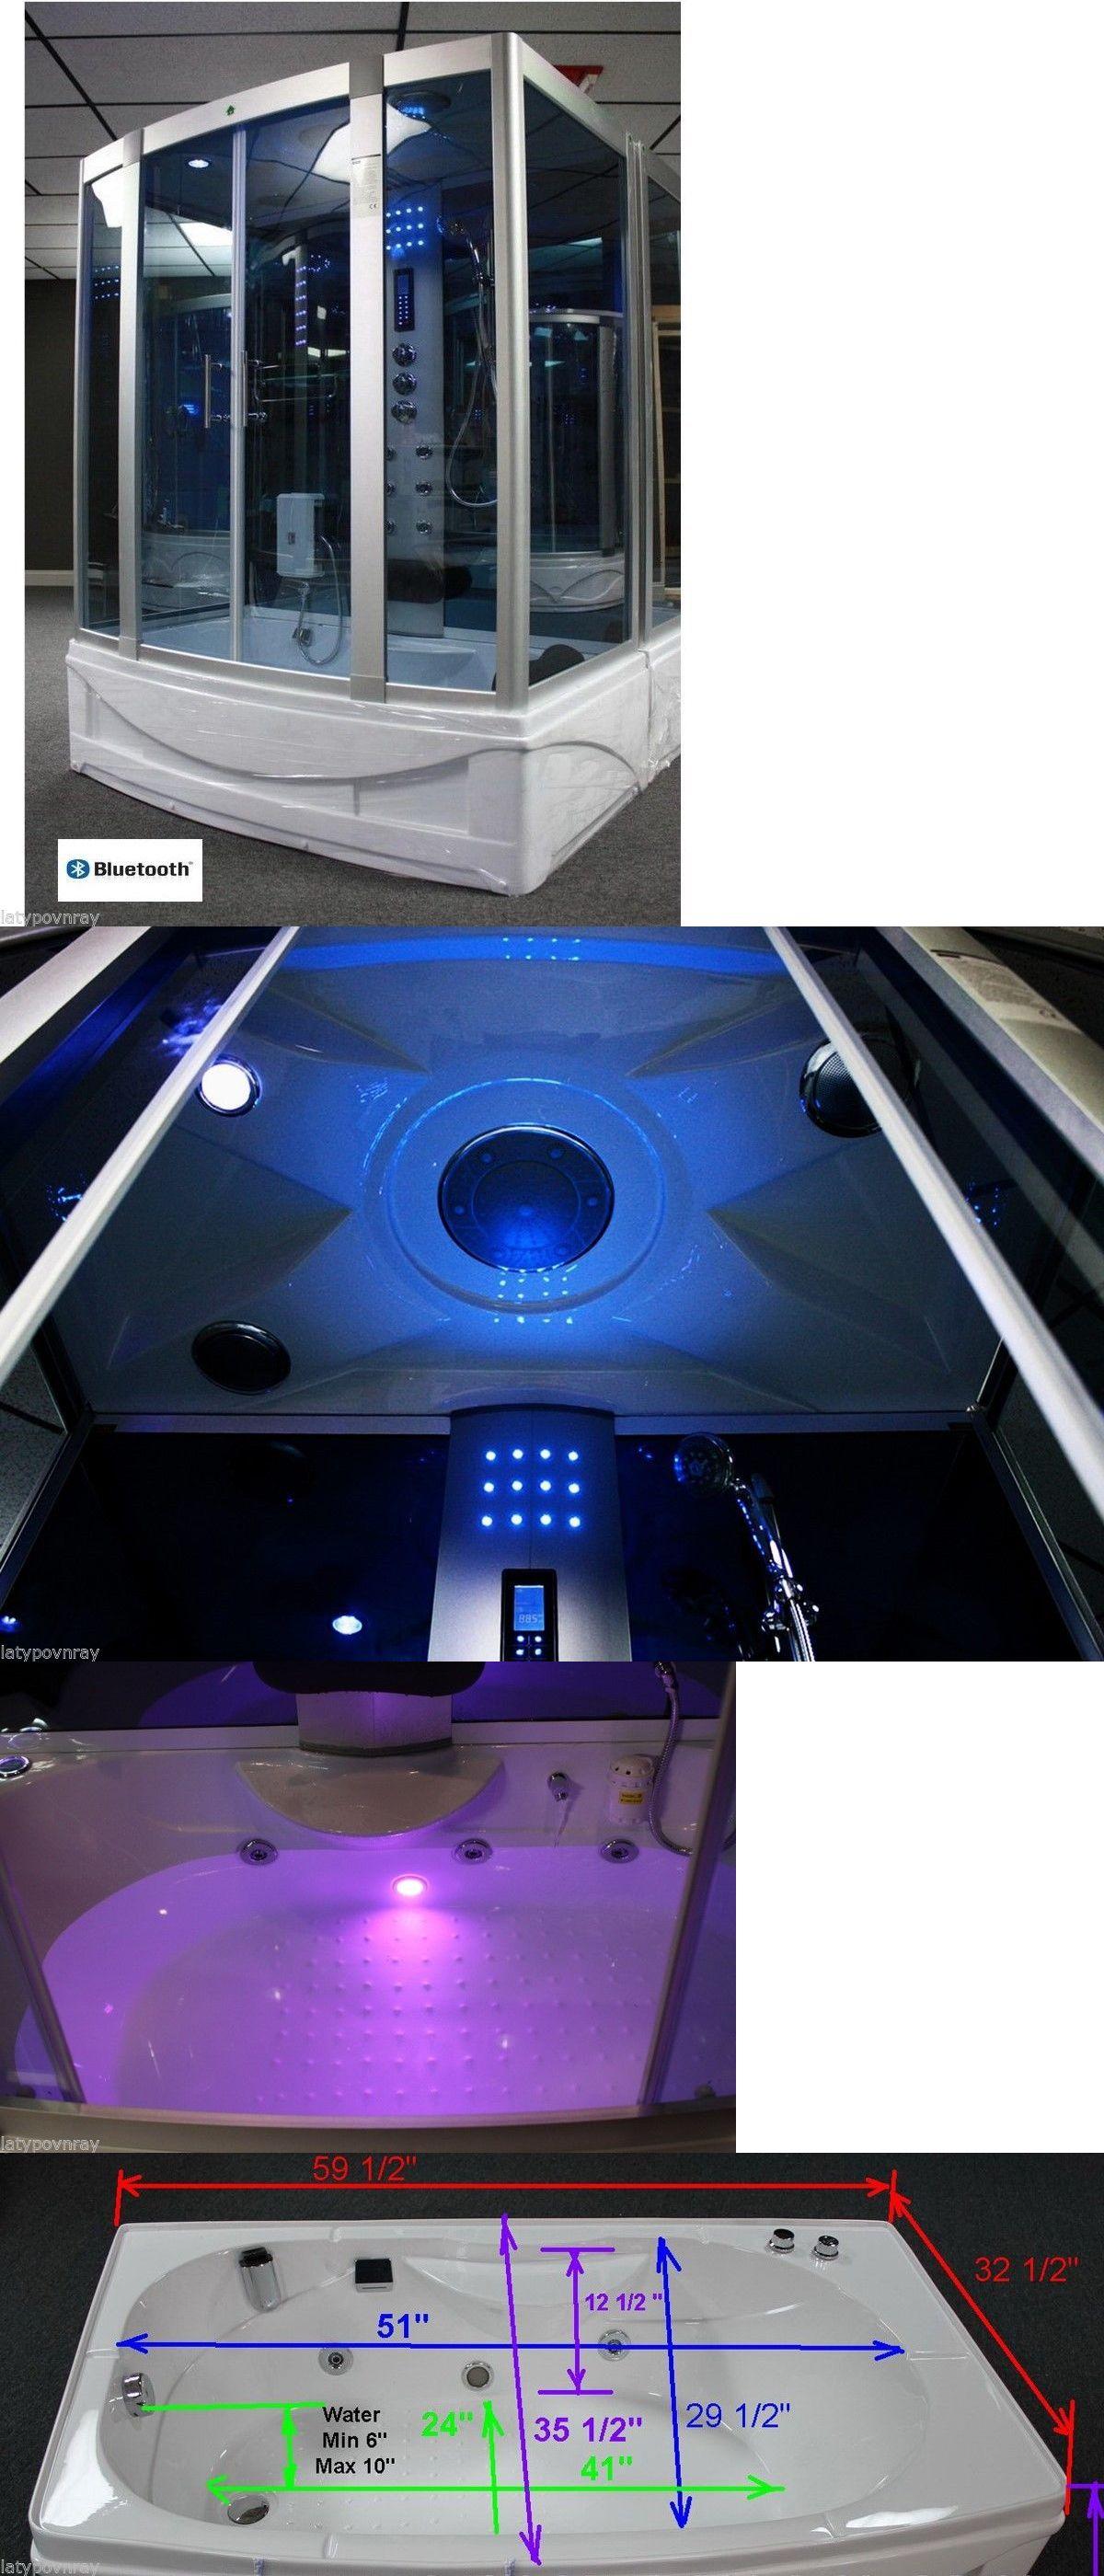 Bathtubs 42025: Steam Shower Cabin,Whirlpool Tub ,Bluetooth.6 Year ...